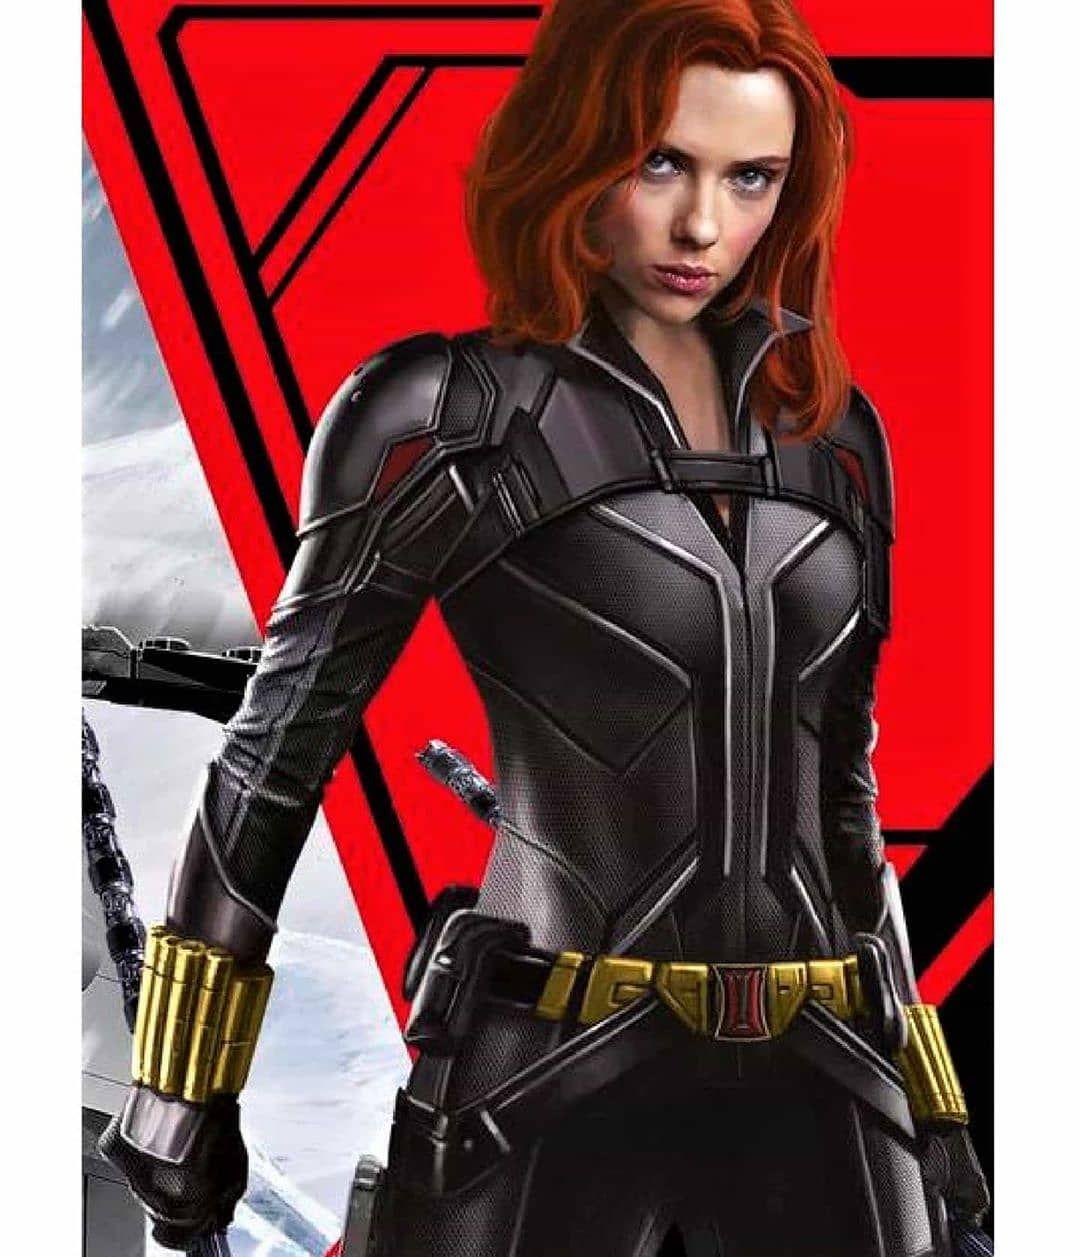 Black Widow Imagen Promocional Deja Tu Like Sigueme Para Mas Contenido U C Heroes Eternals Thor Skarlett Johansson Marvel Persy